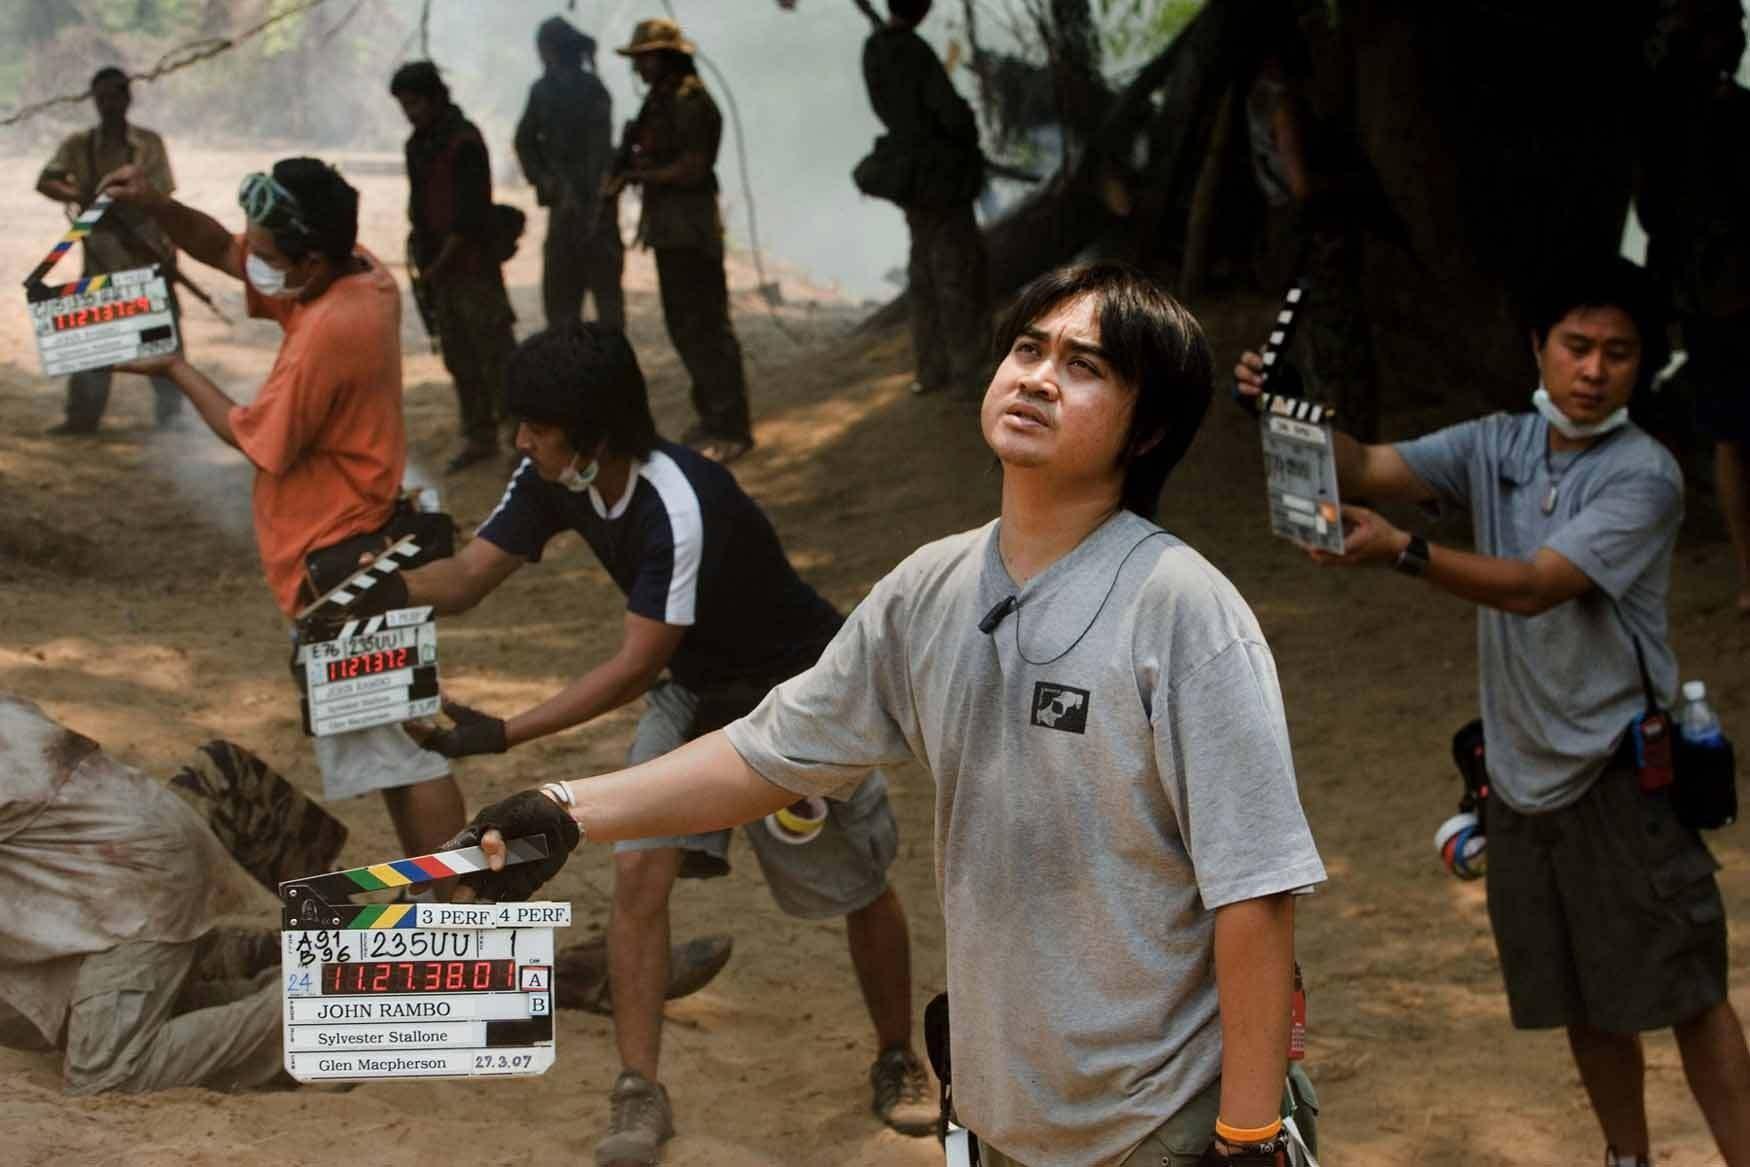 Rambo Behind the Scenes Photos & Tech Specs